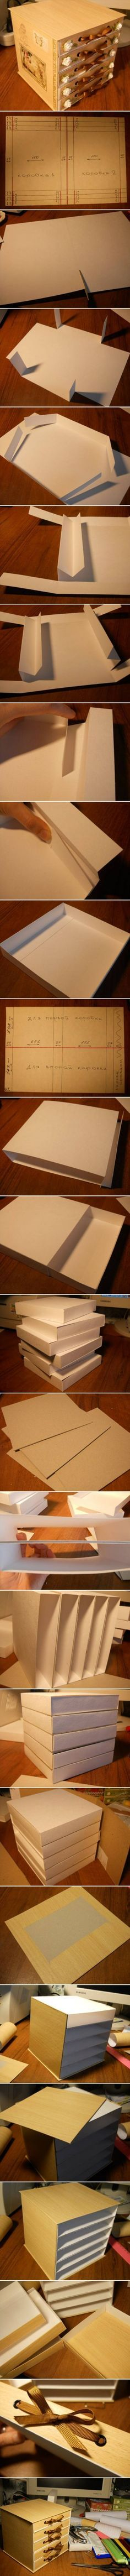 DIY Cardboard Cabinet   DIY Creative Ideas